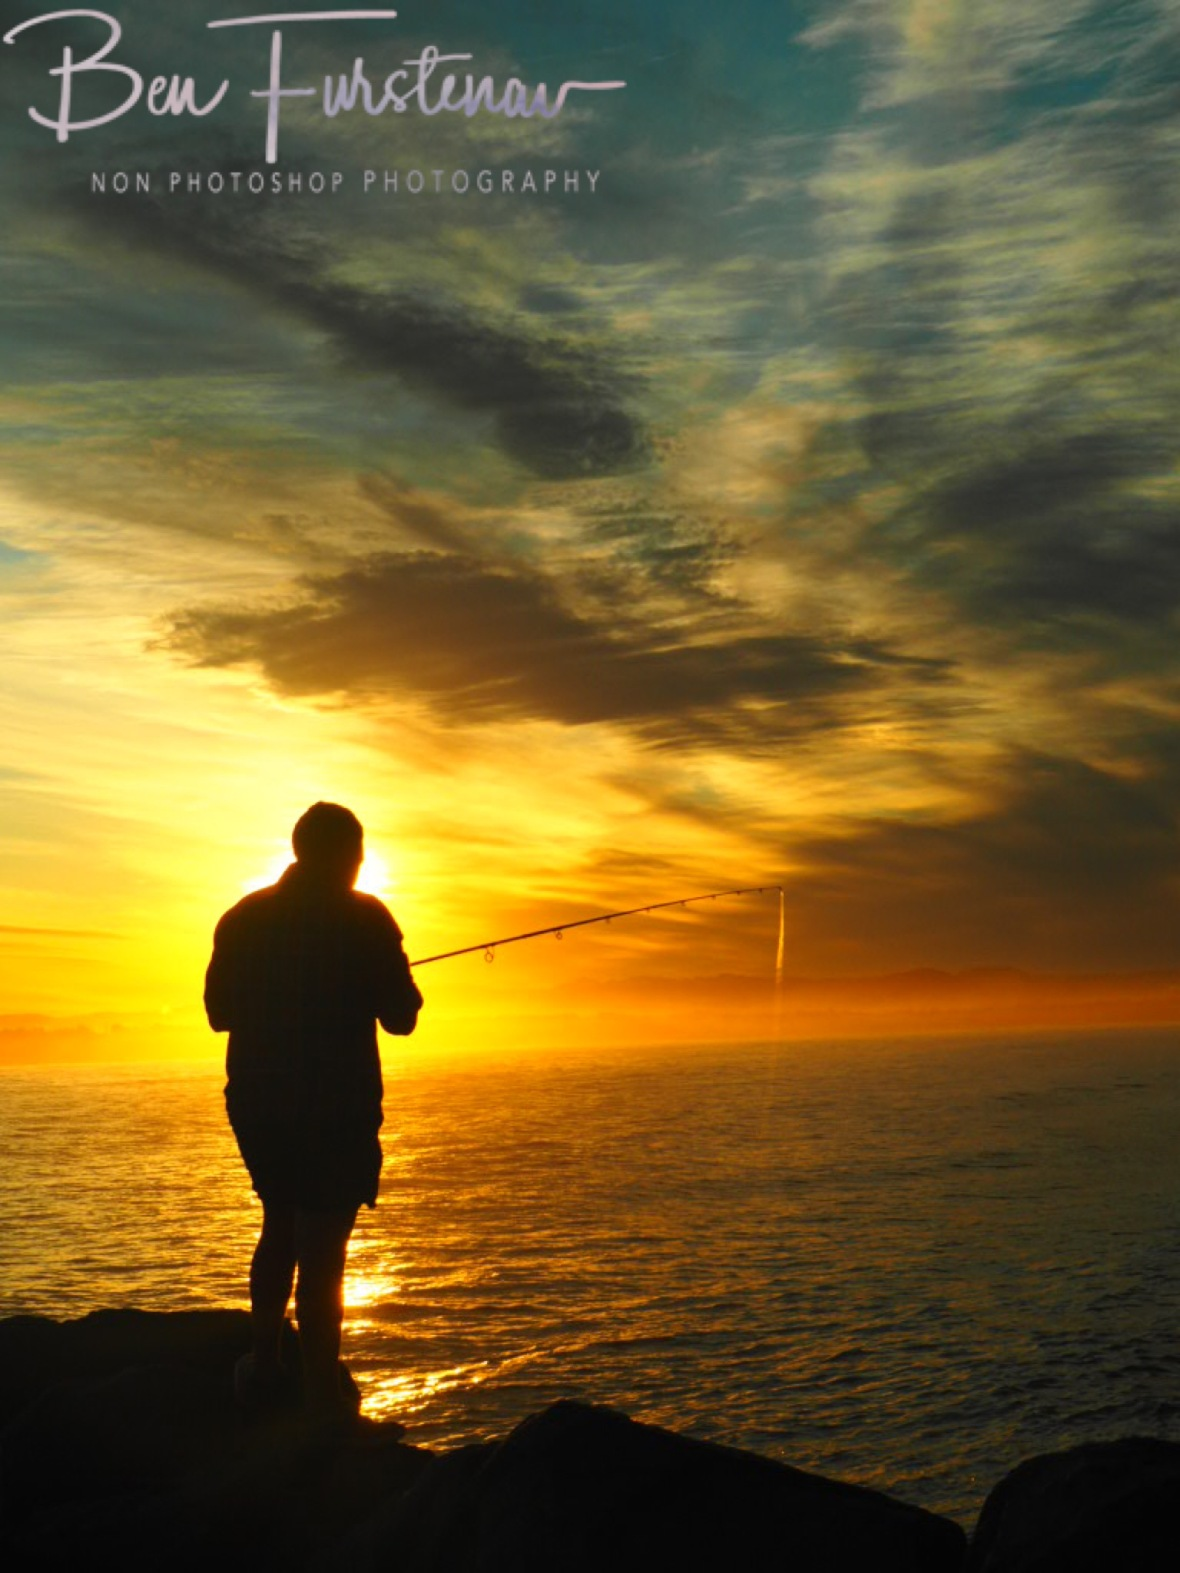 Fishing @ Crowdy Head, Northern New South Wales, Australia